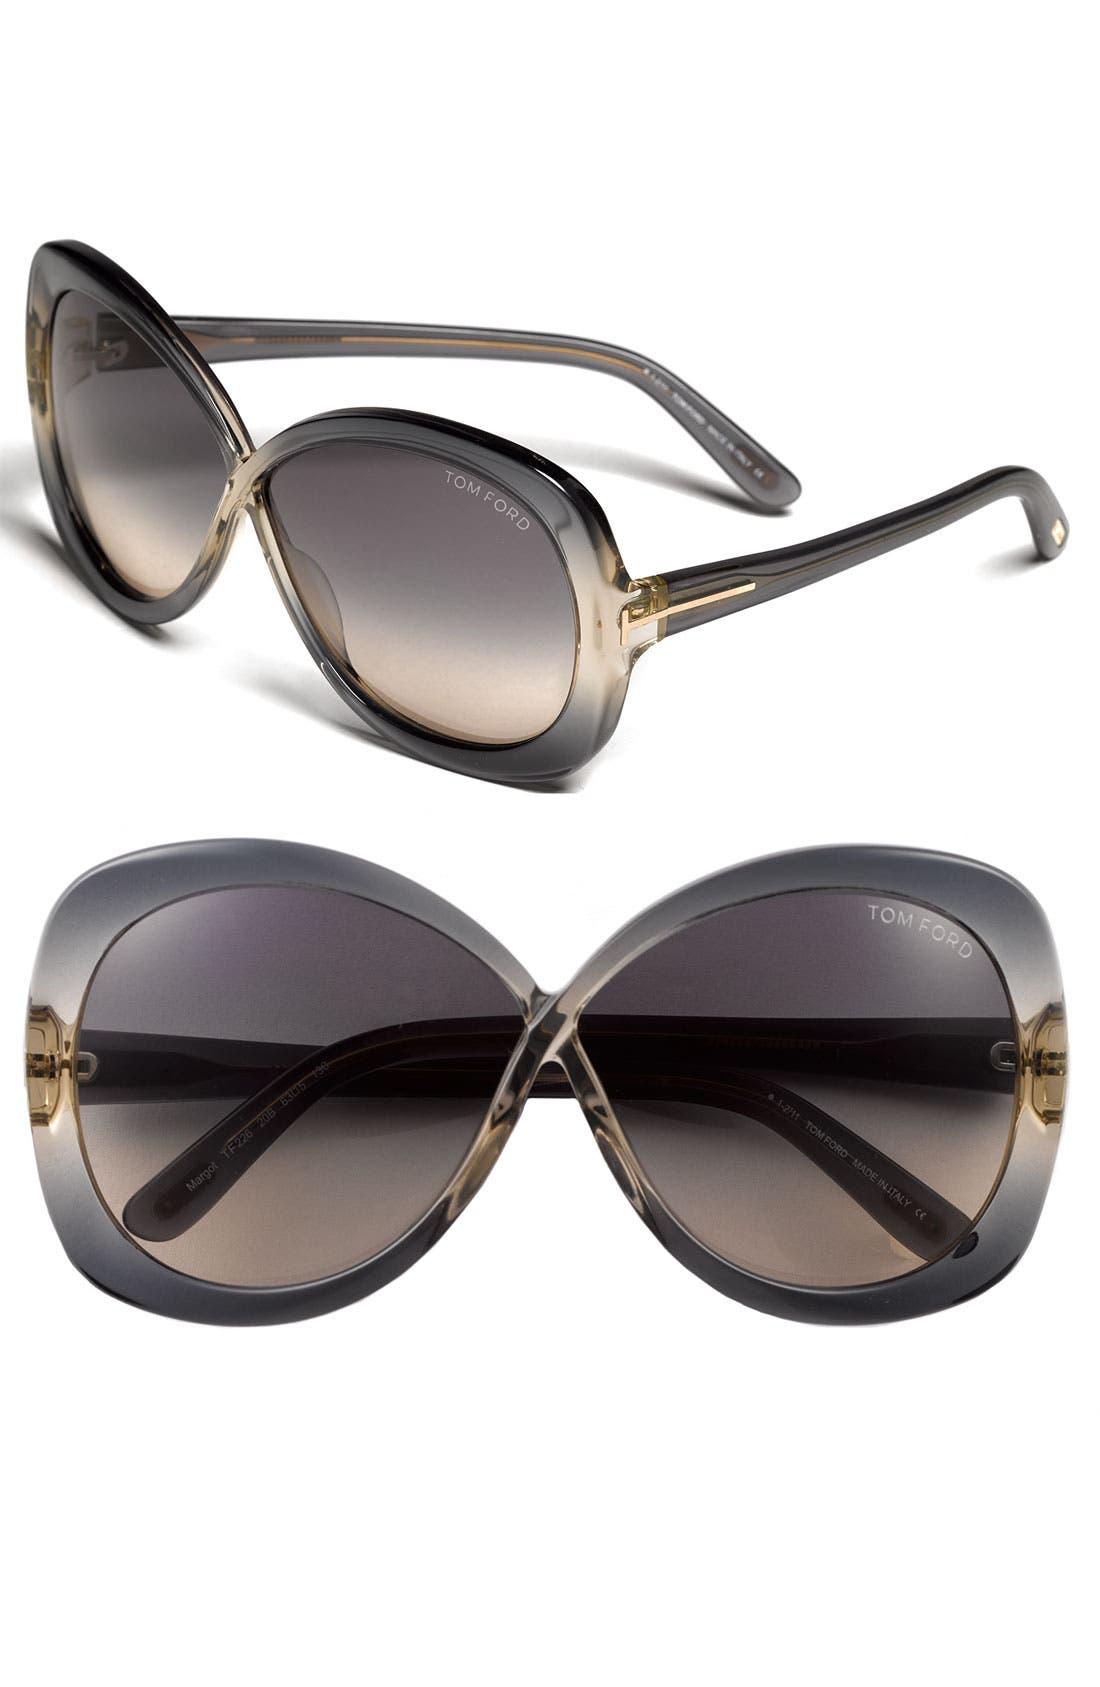 Main Image - Tom Ford 'Margot' Oversized Sunglasses